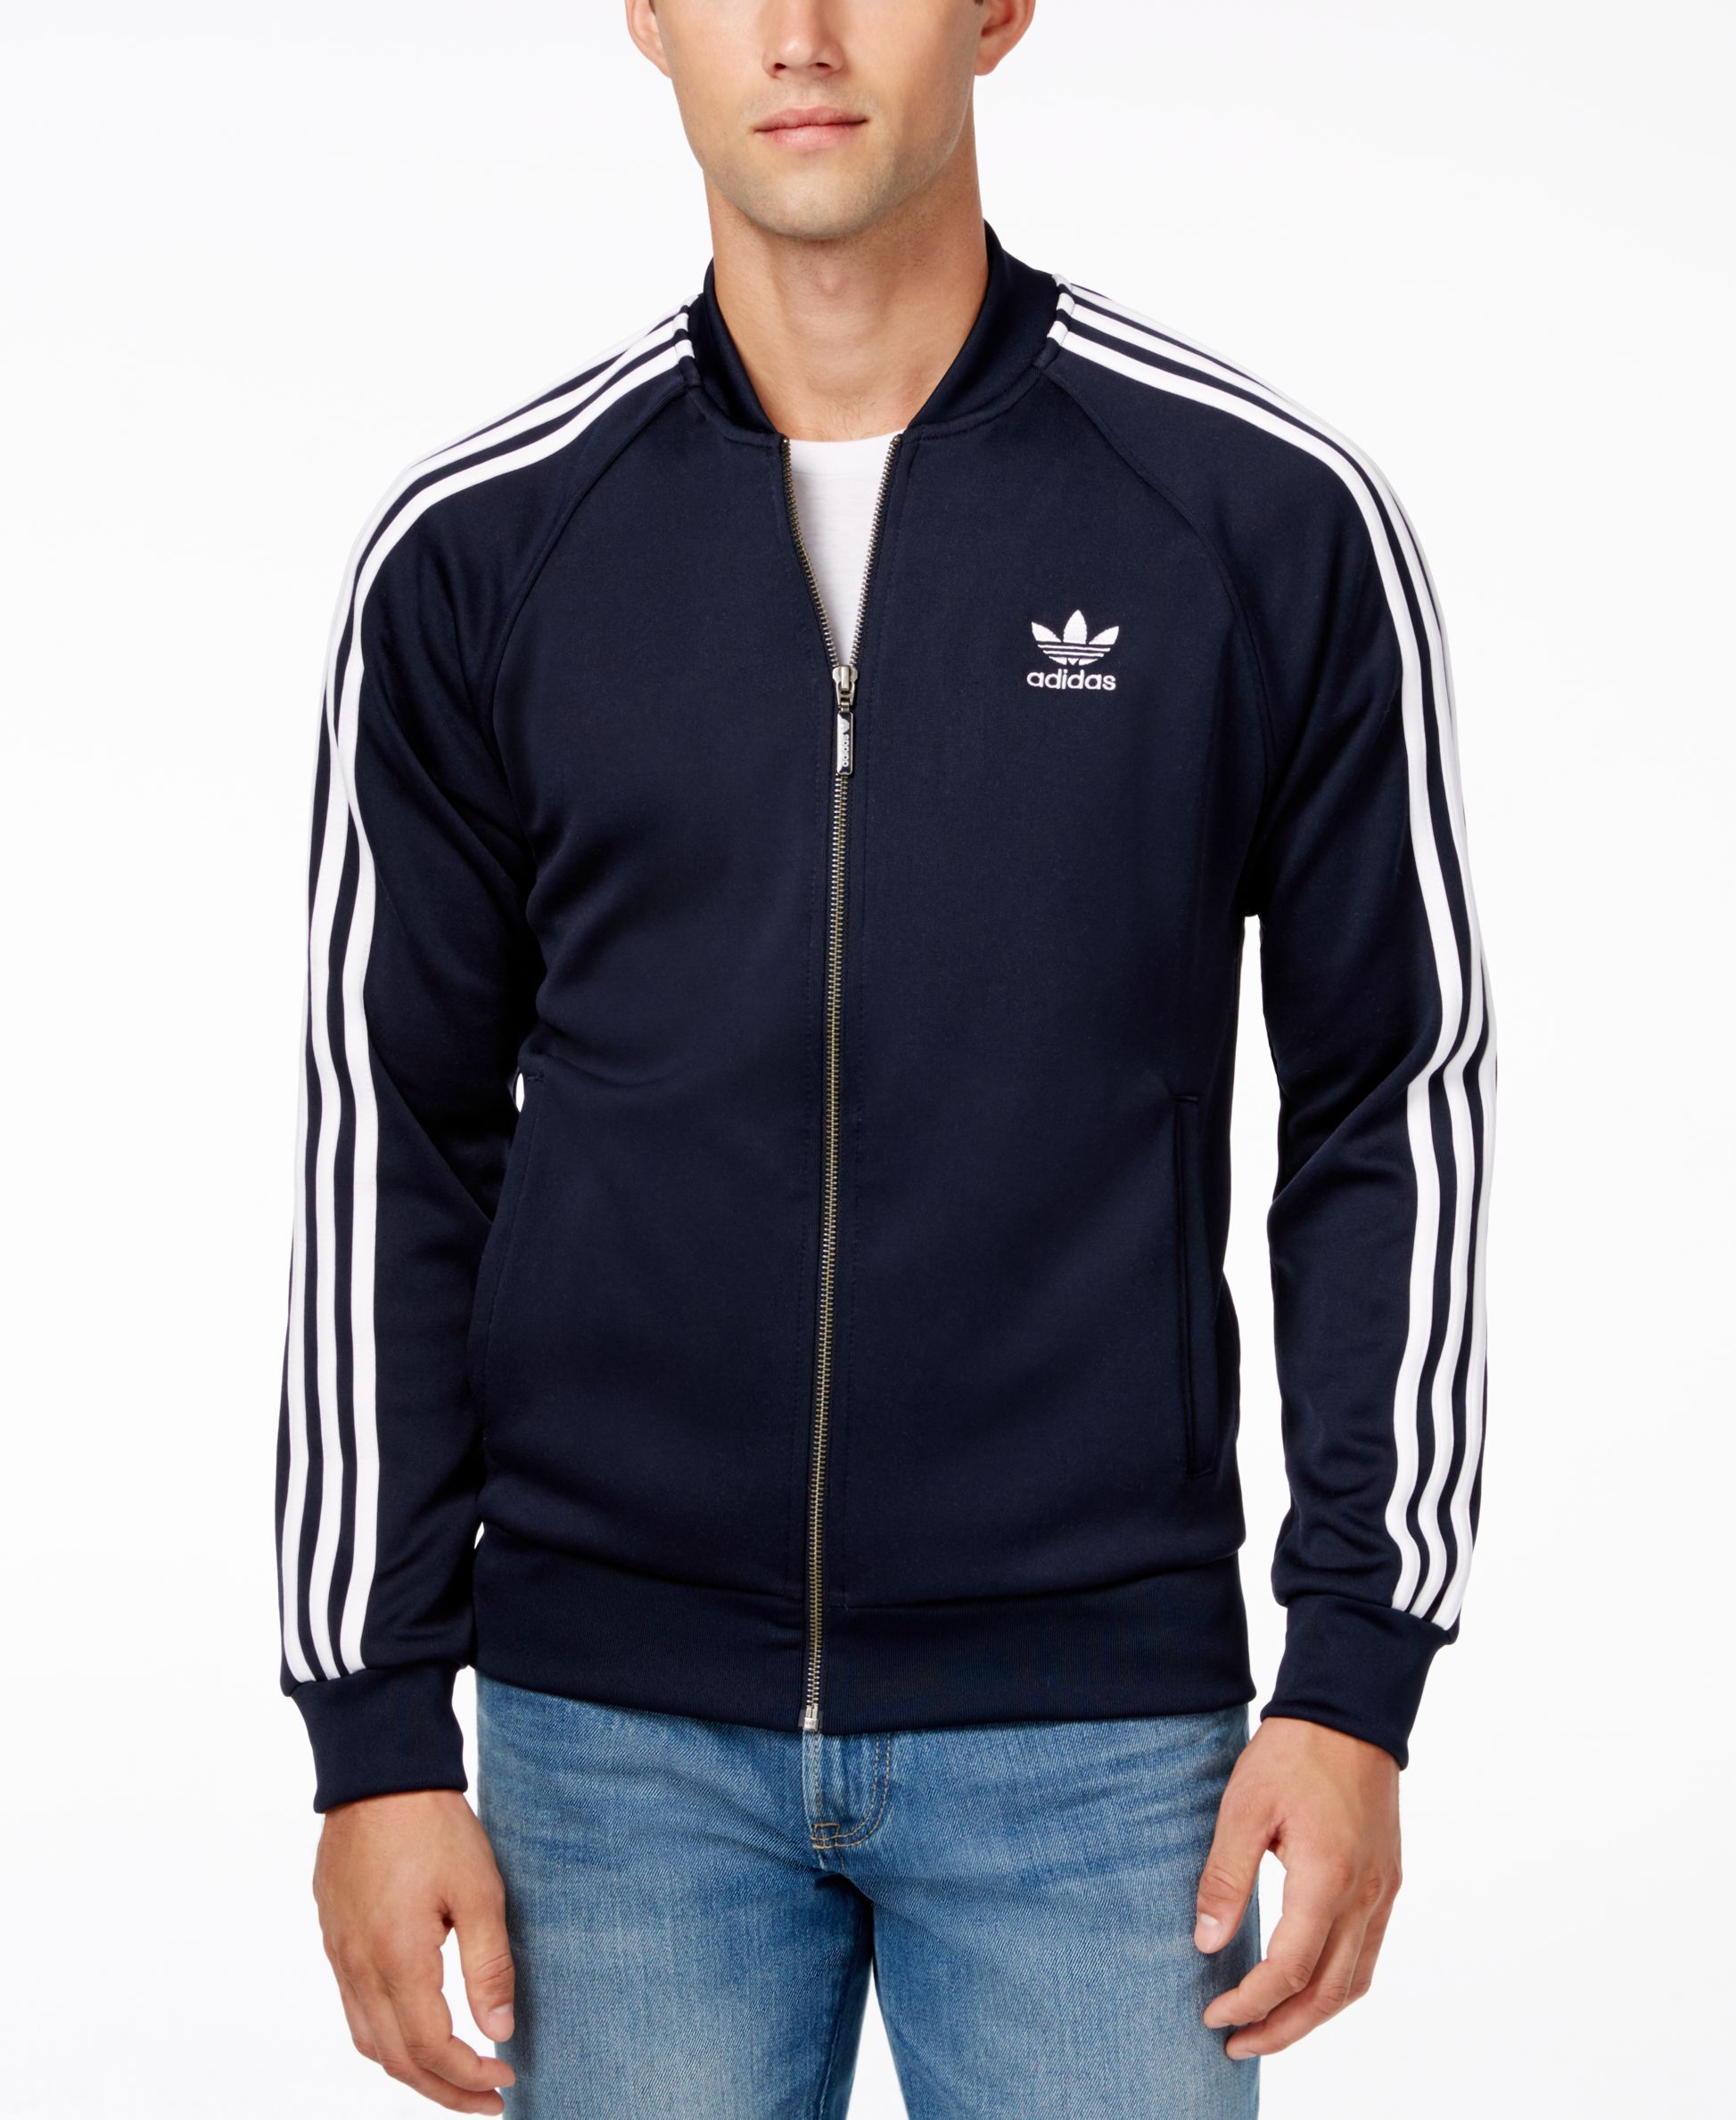 142756530267 adidas Originals Men s Superstar Track Jacket